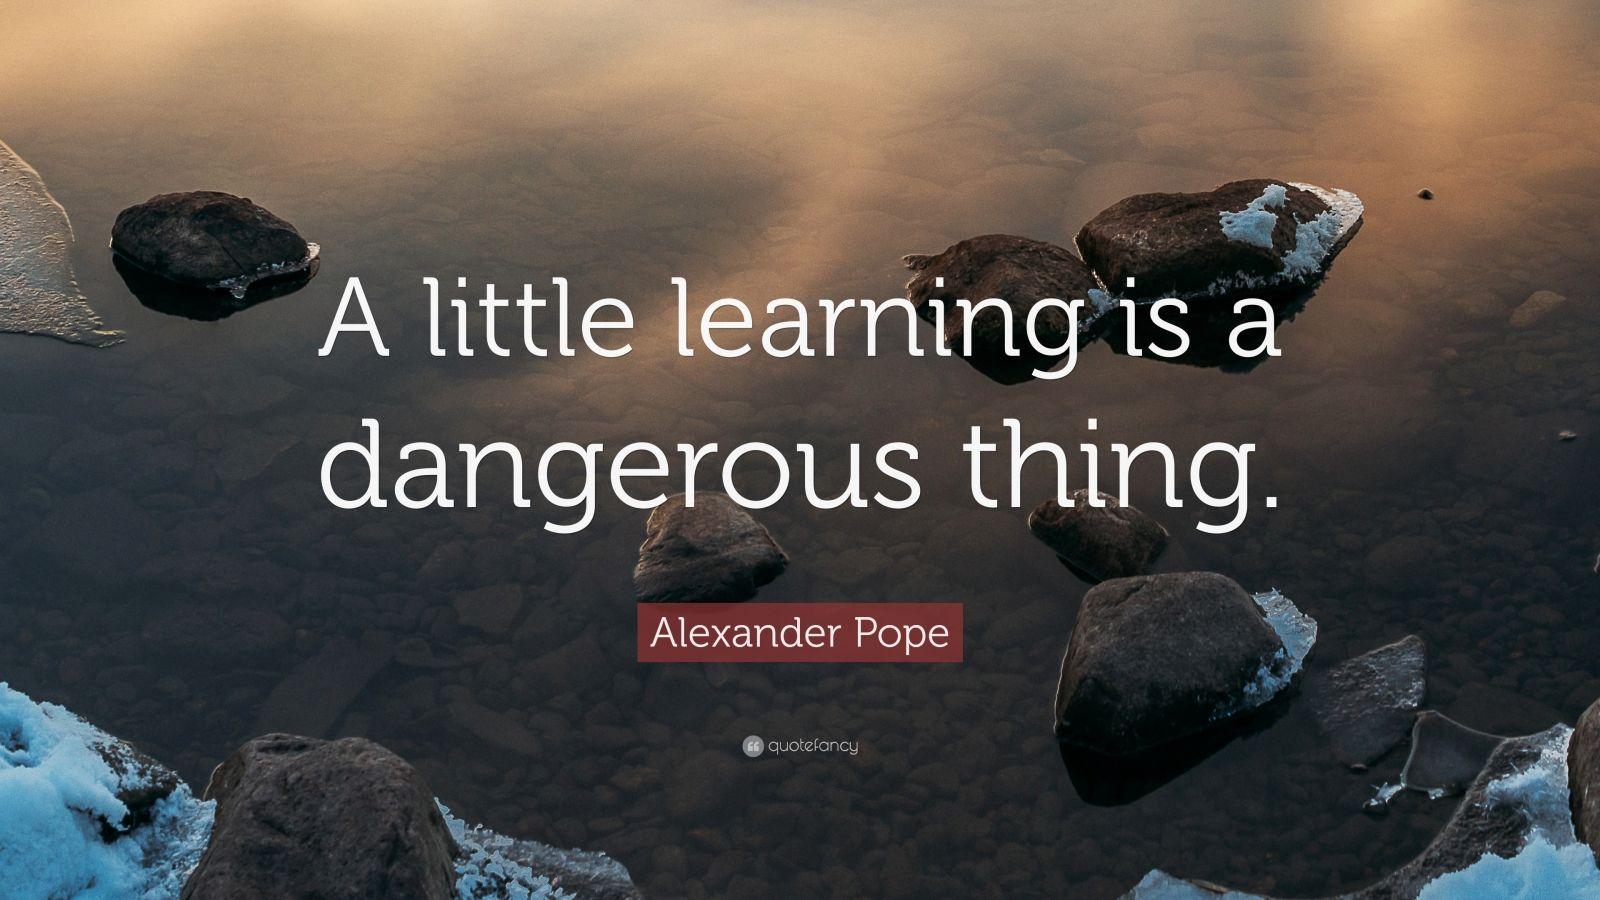 a little learning is a dangerous thing J thorac cardiovasc surg 2015 may149(5):e82 doi: 101016/jjtcvs201501 033 epub 2015 jan 24 a little knowledge is a dangerous thing so is a lot.